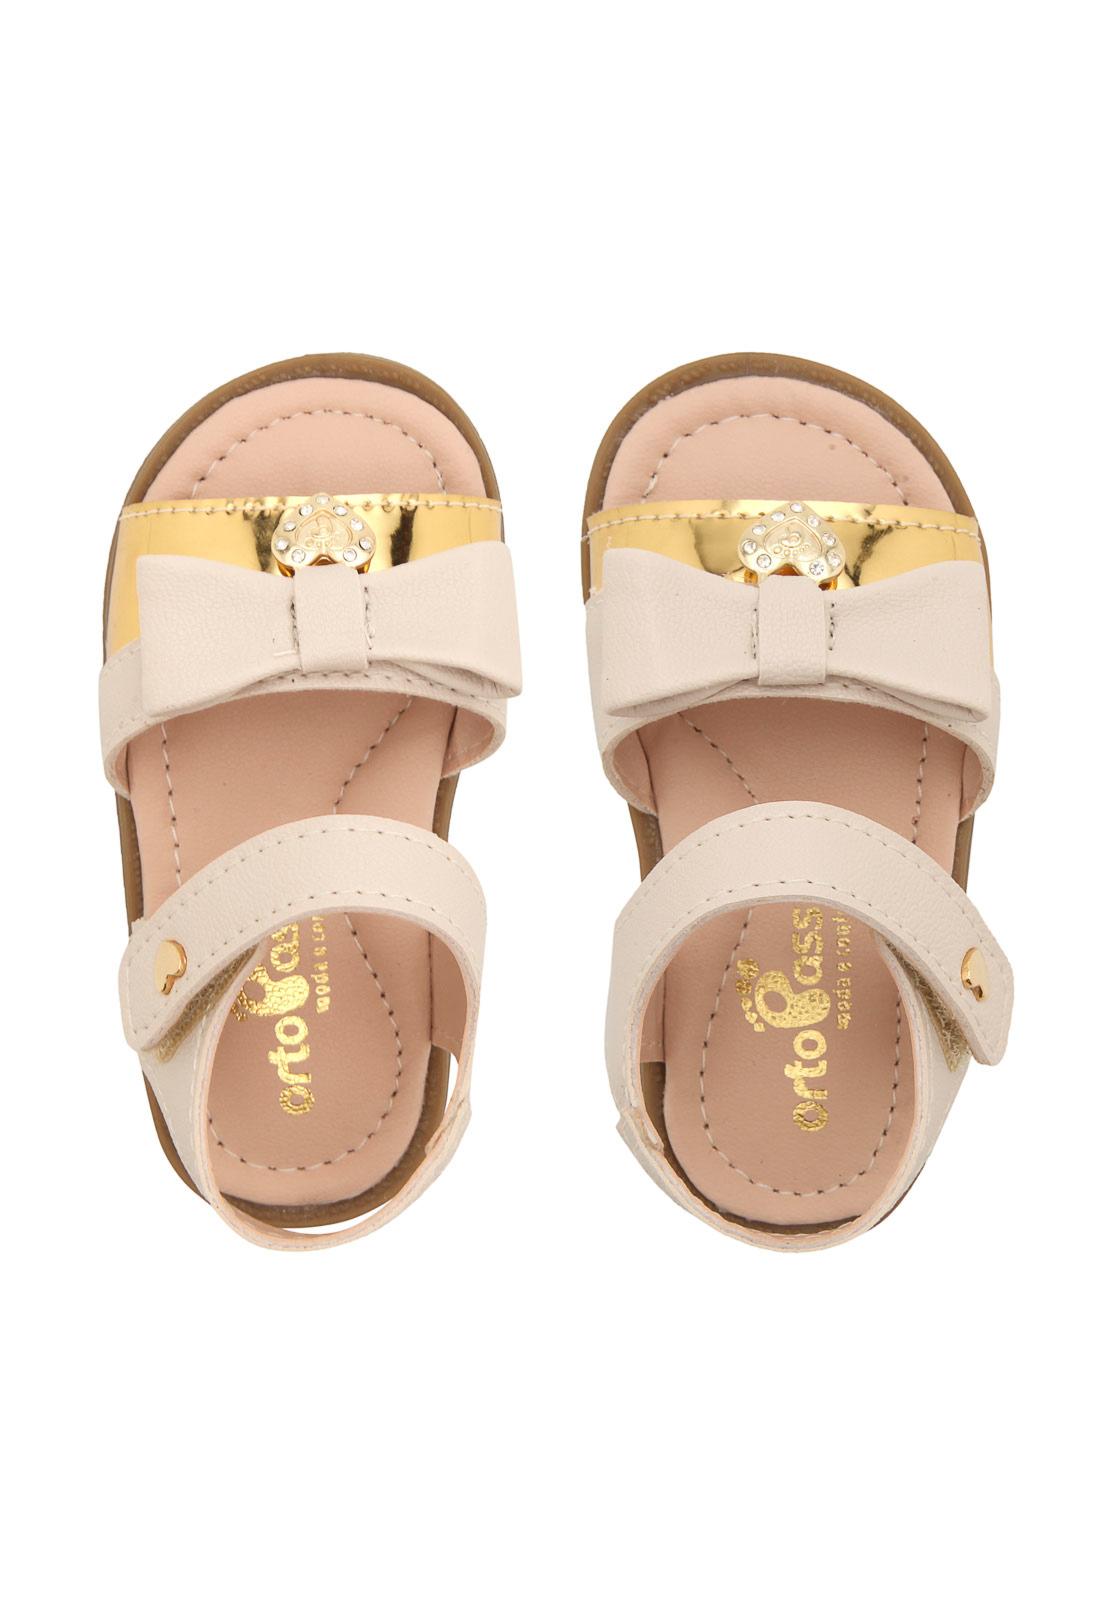 Sandalia Orto Passo Nude/Dourado Feminino 4427